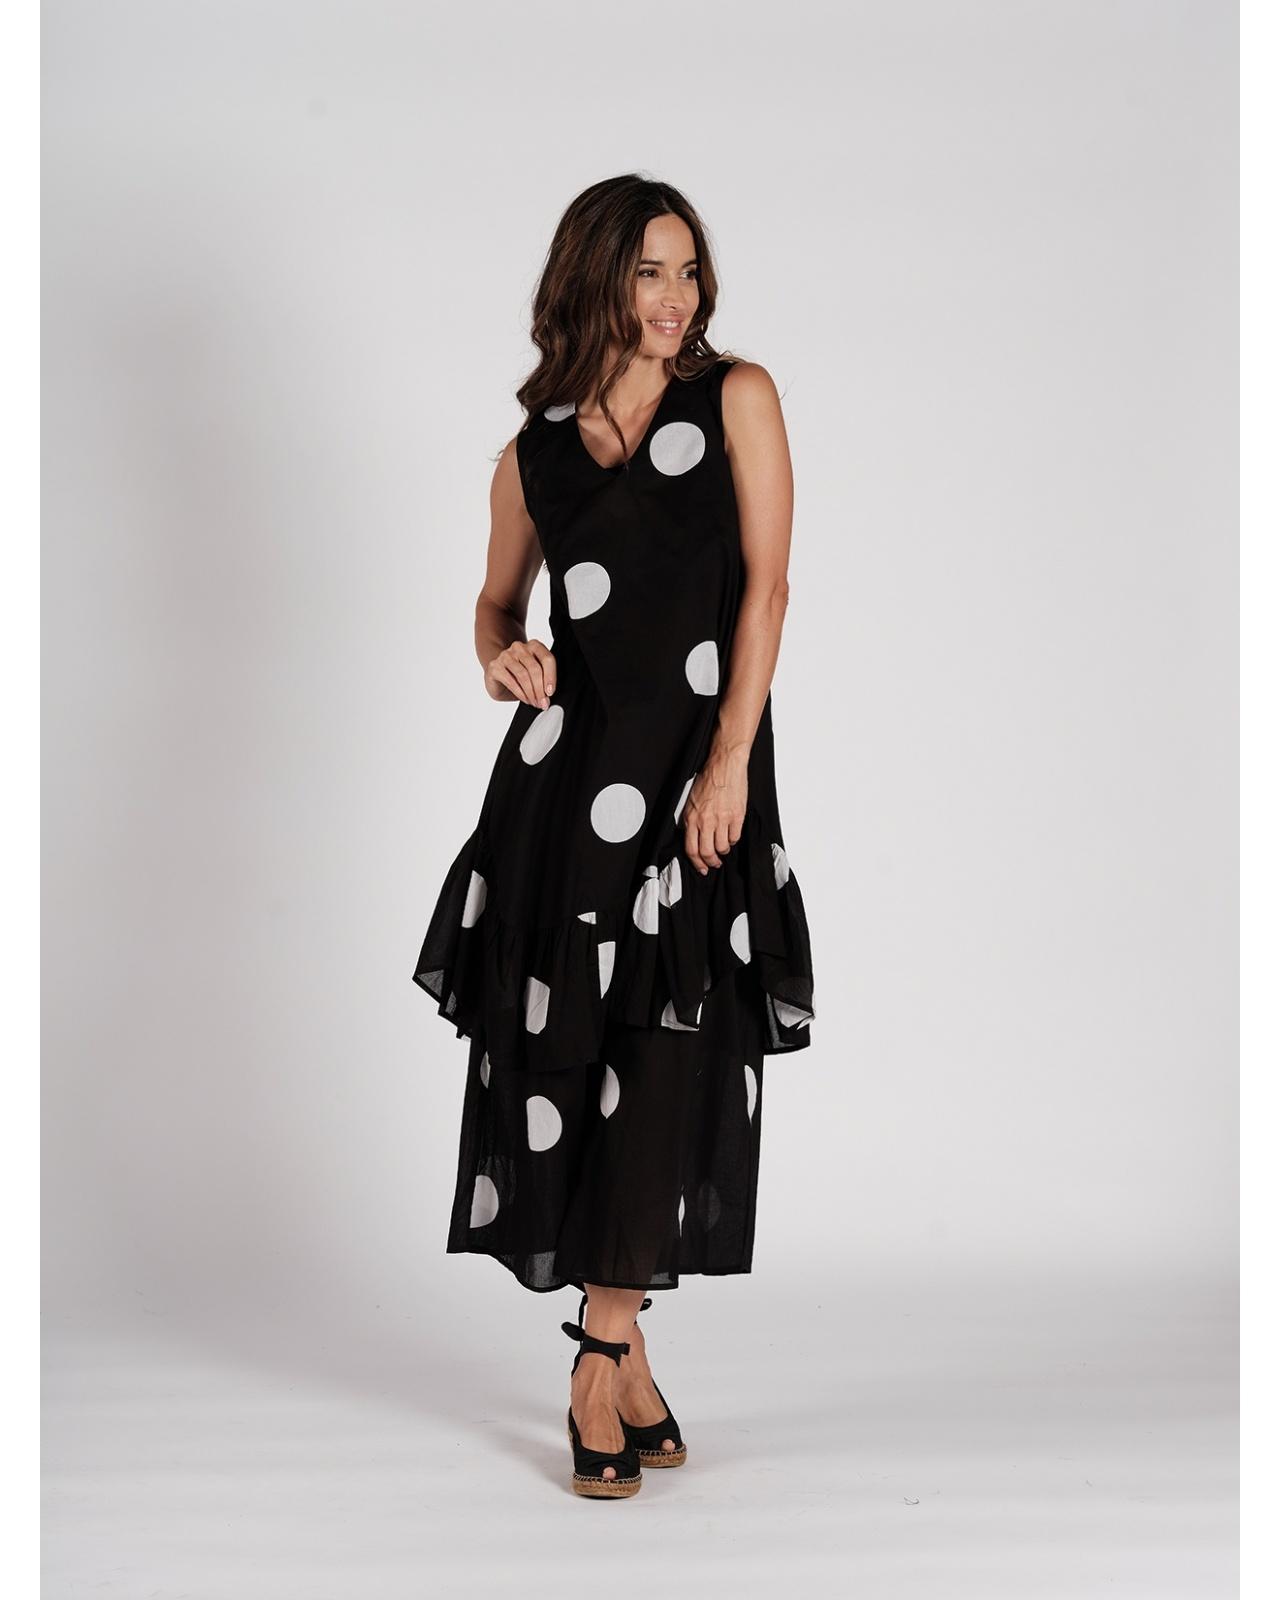 DRESS MONT VENTOUX N°39 BLACK/WHITE